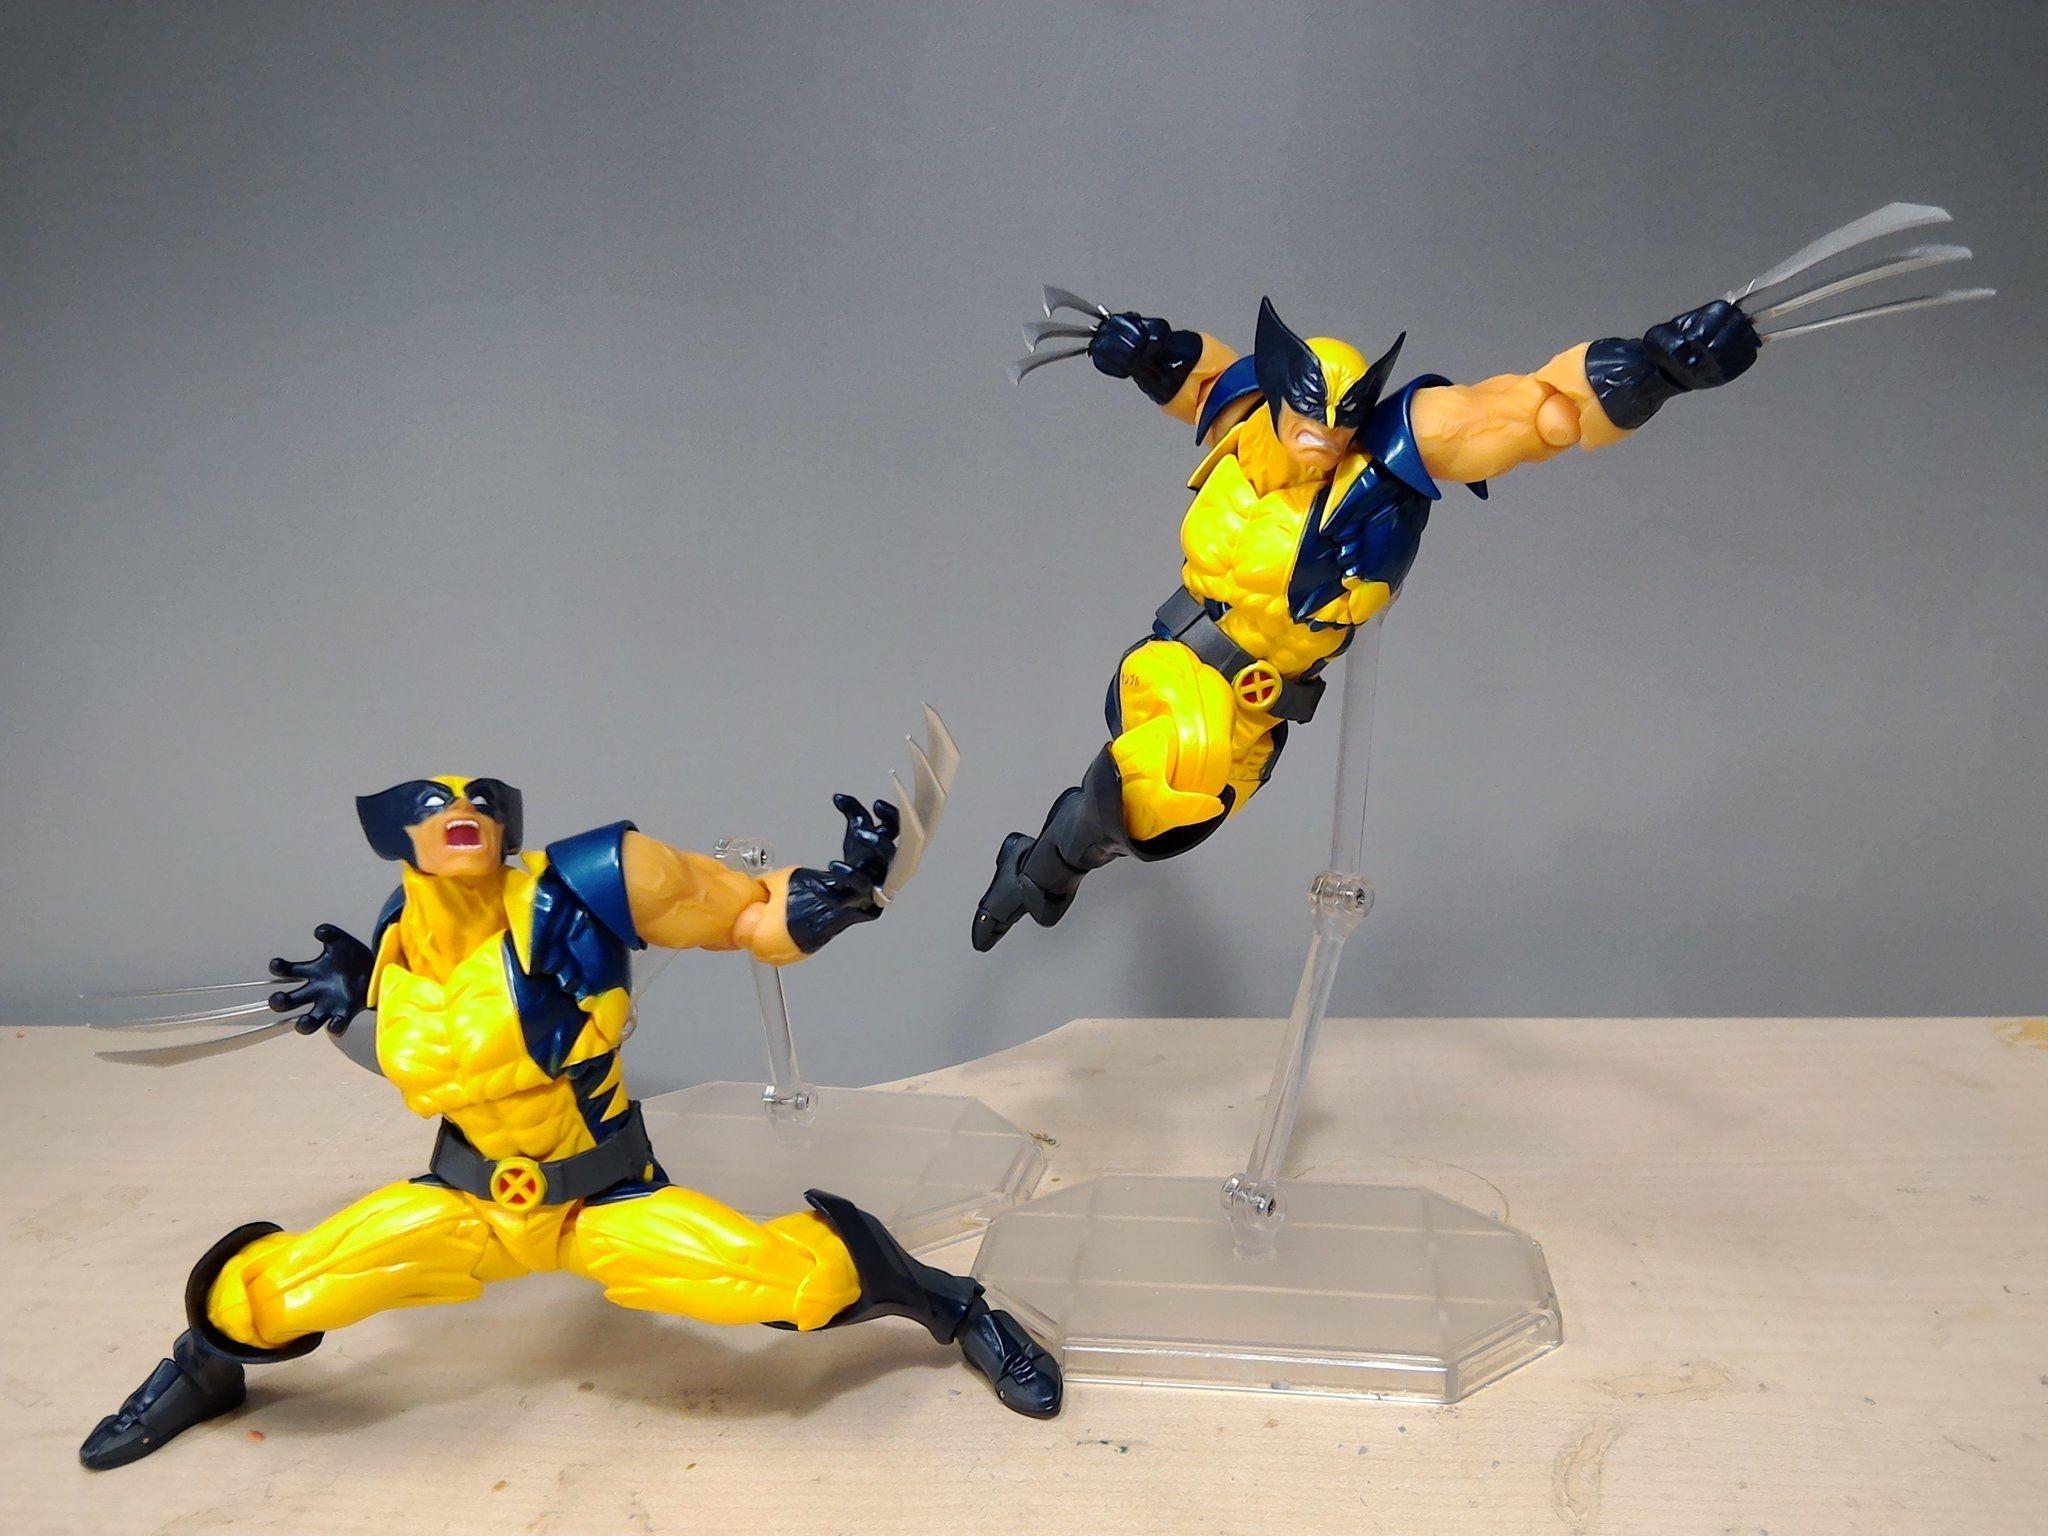 Kaiyodo Revoltech Amazing Yamaguchi Wolverine X-Men Action Figure Spielzeug